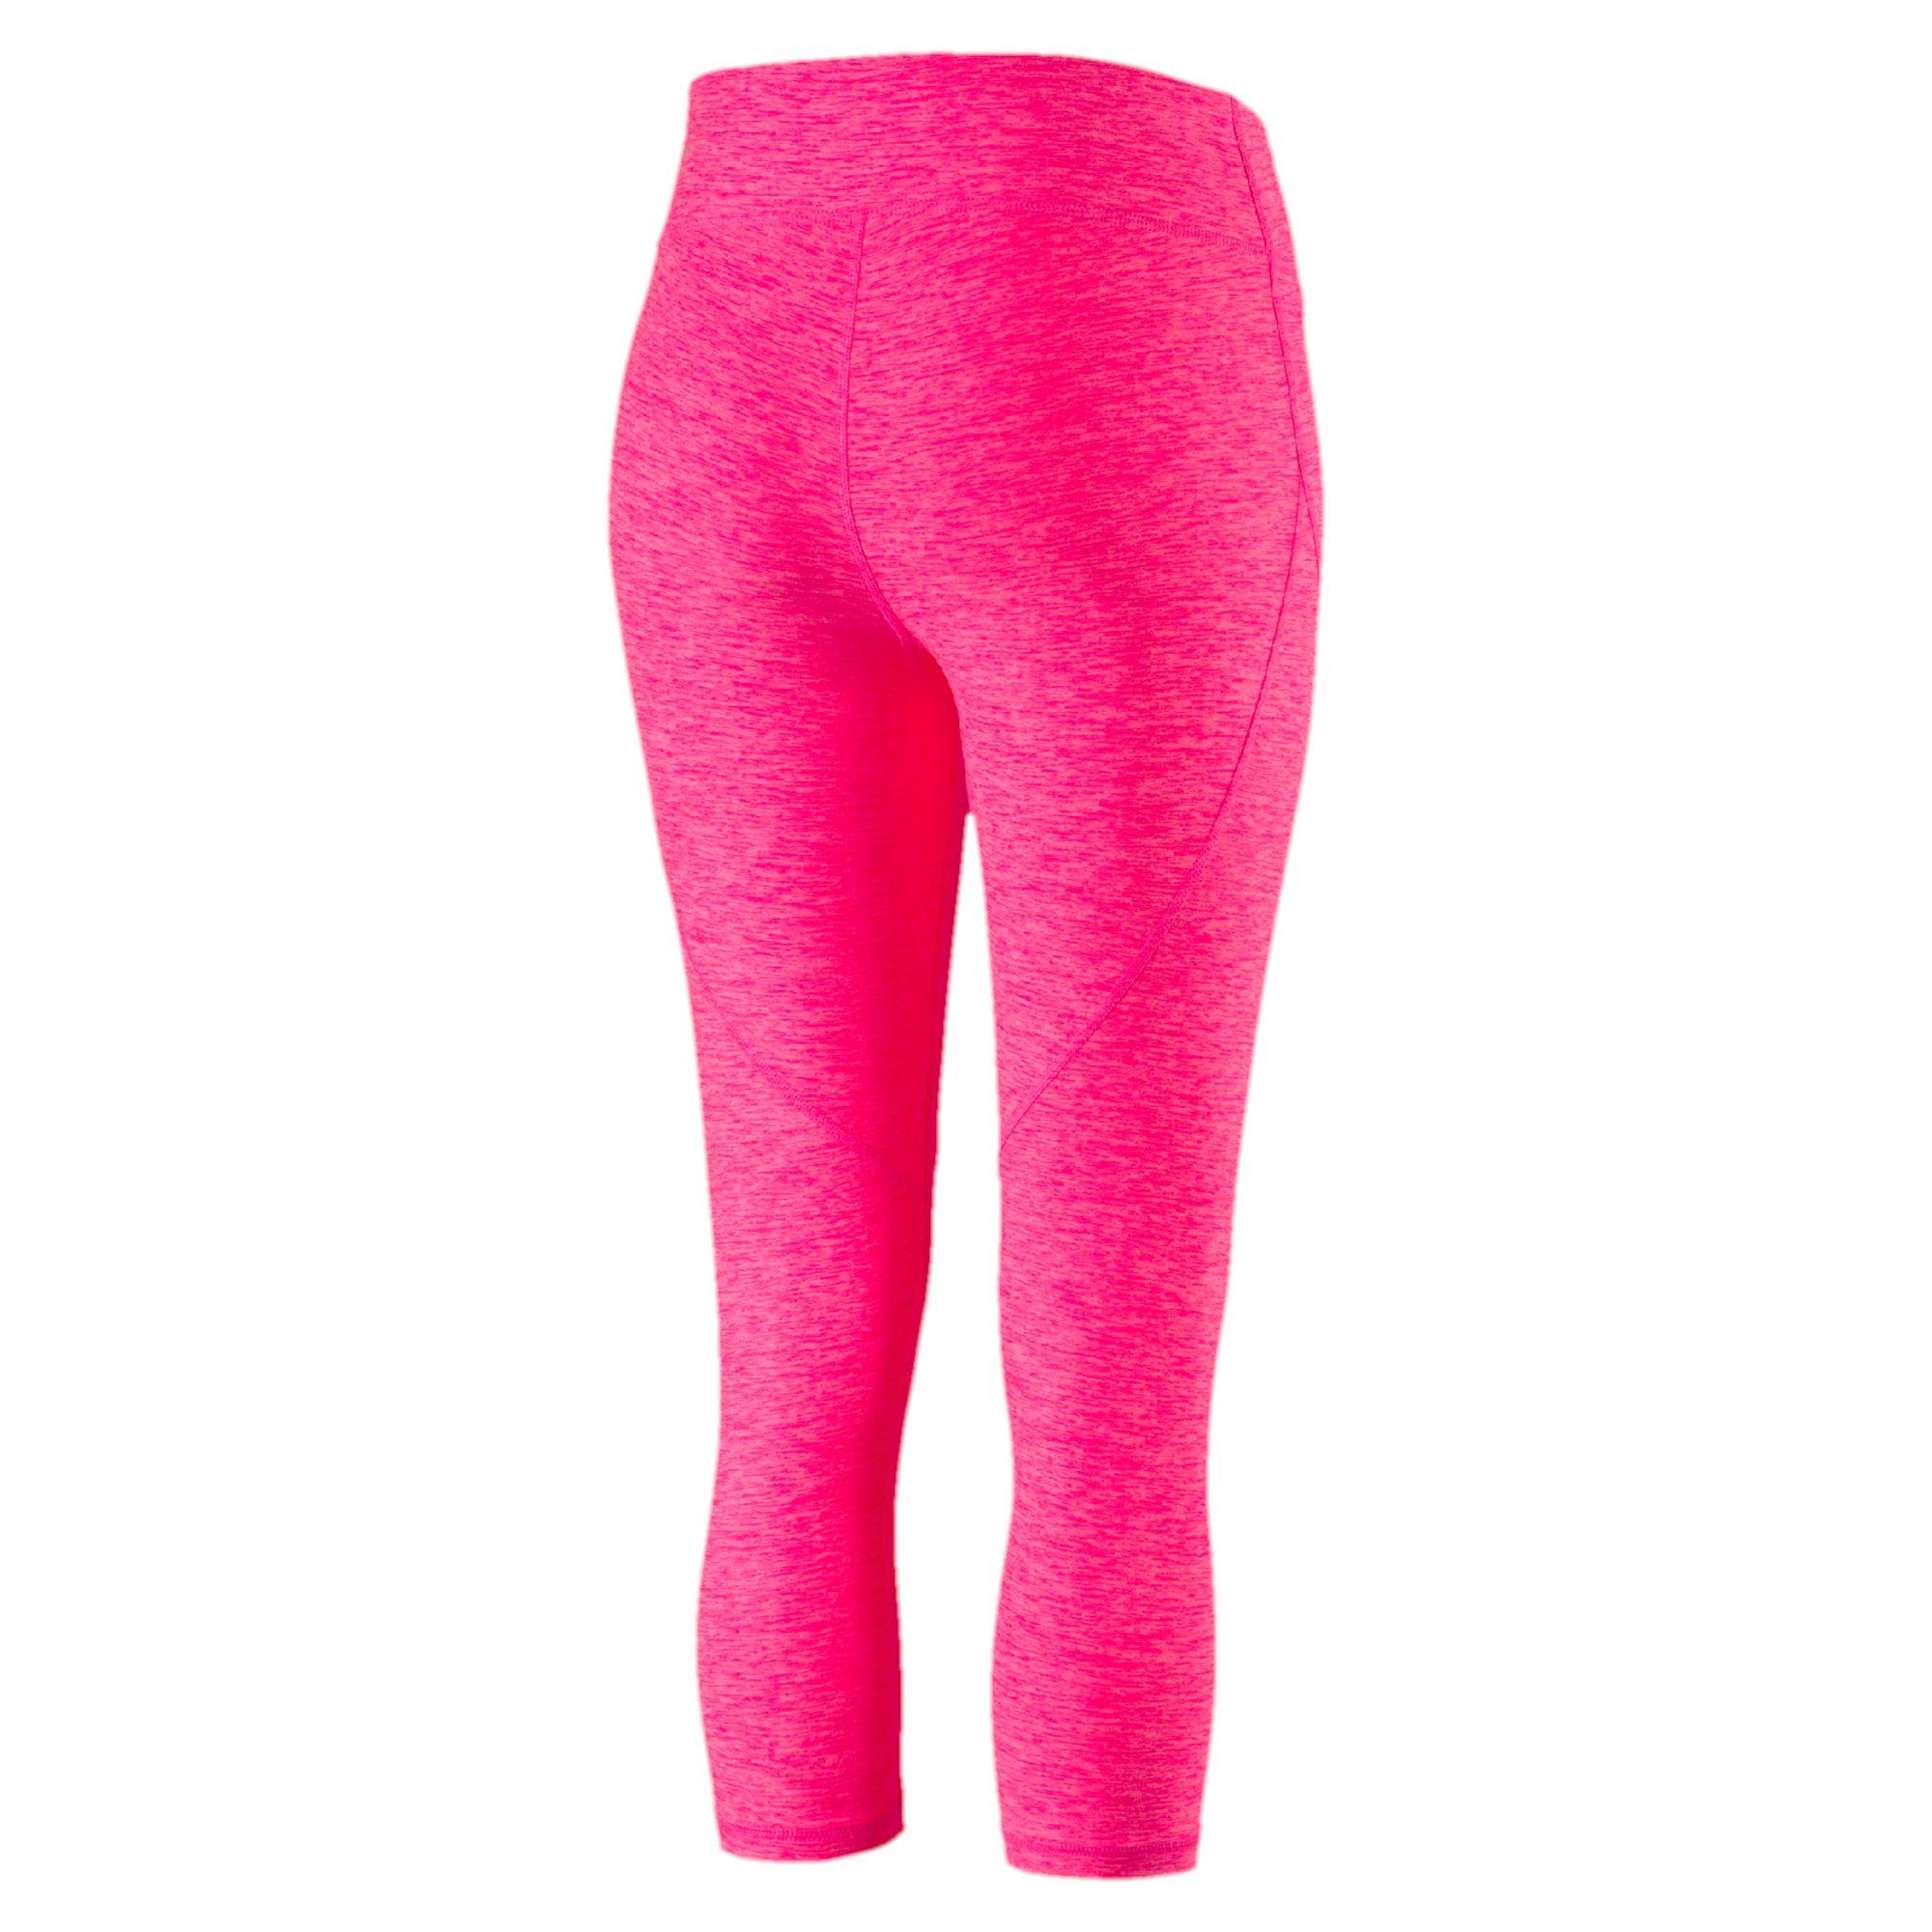 puma active training damen yogini heather 3 4 sporthose. Black Bedroom Furniture Sets. Home Design Ideas